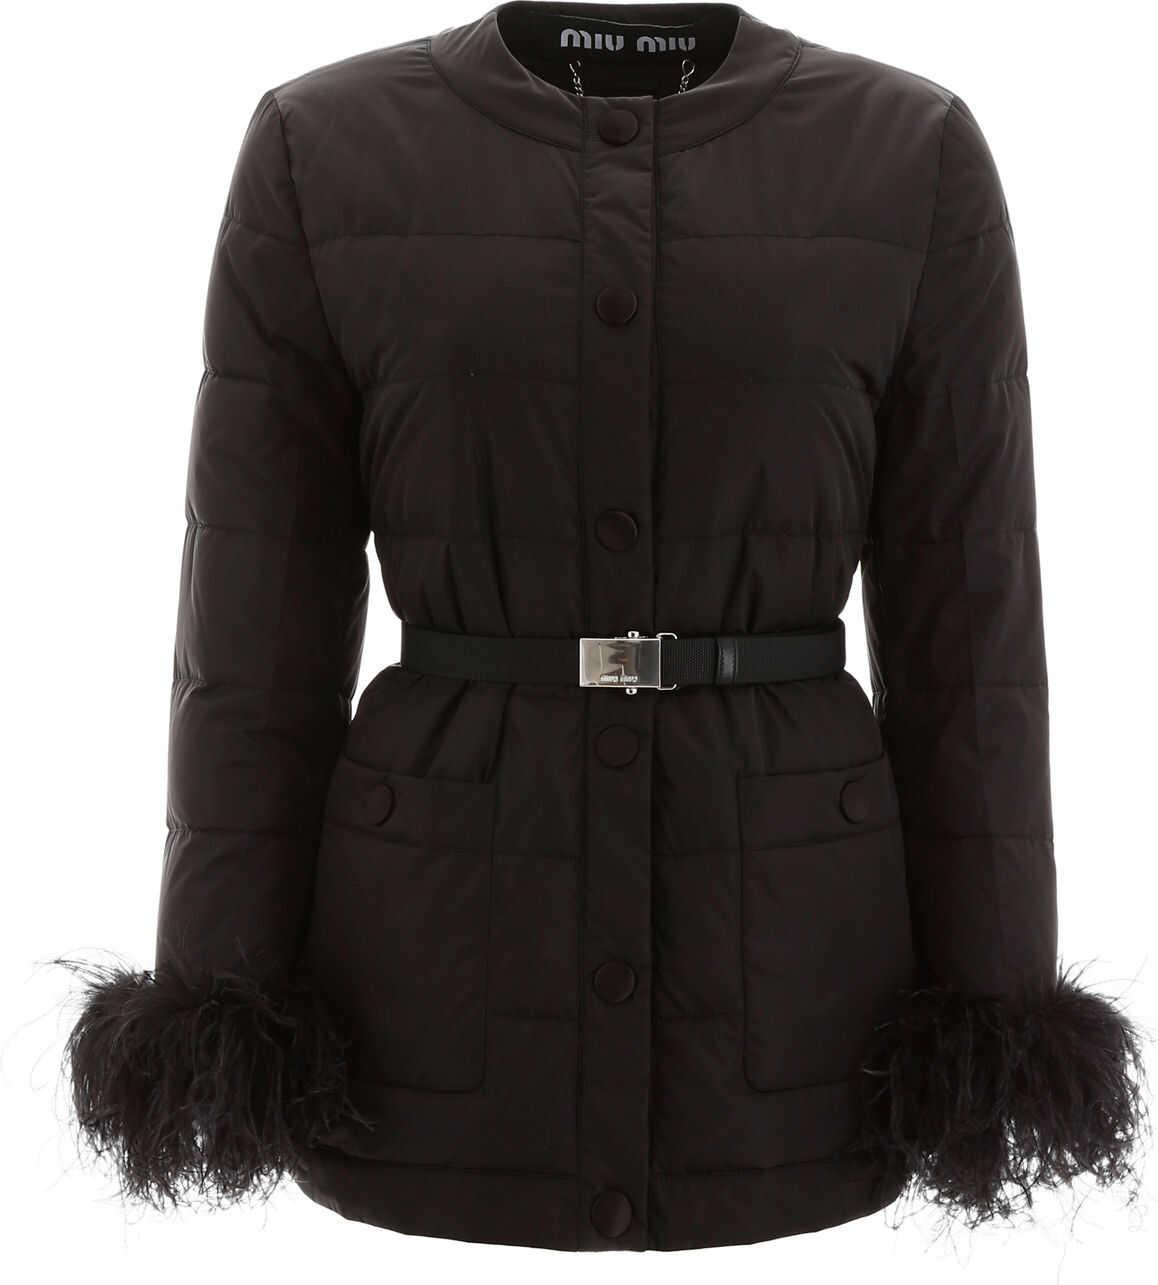 Miu Miu Puffer Jacket With Ostrich Feathers NERO